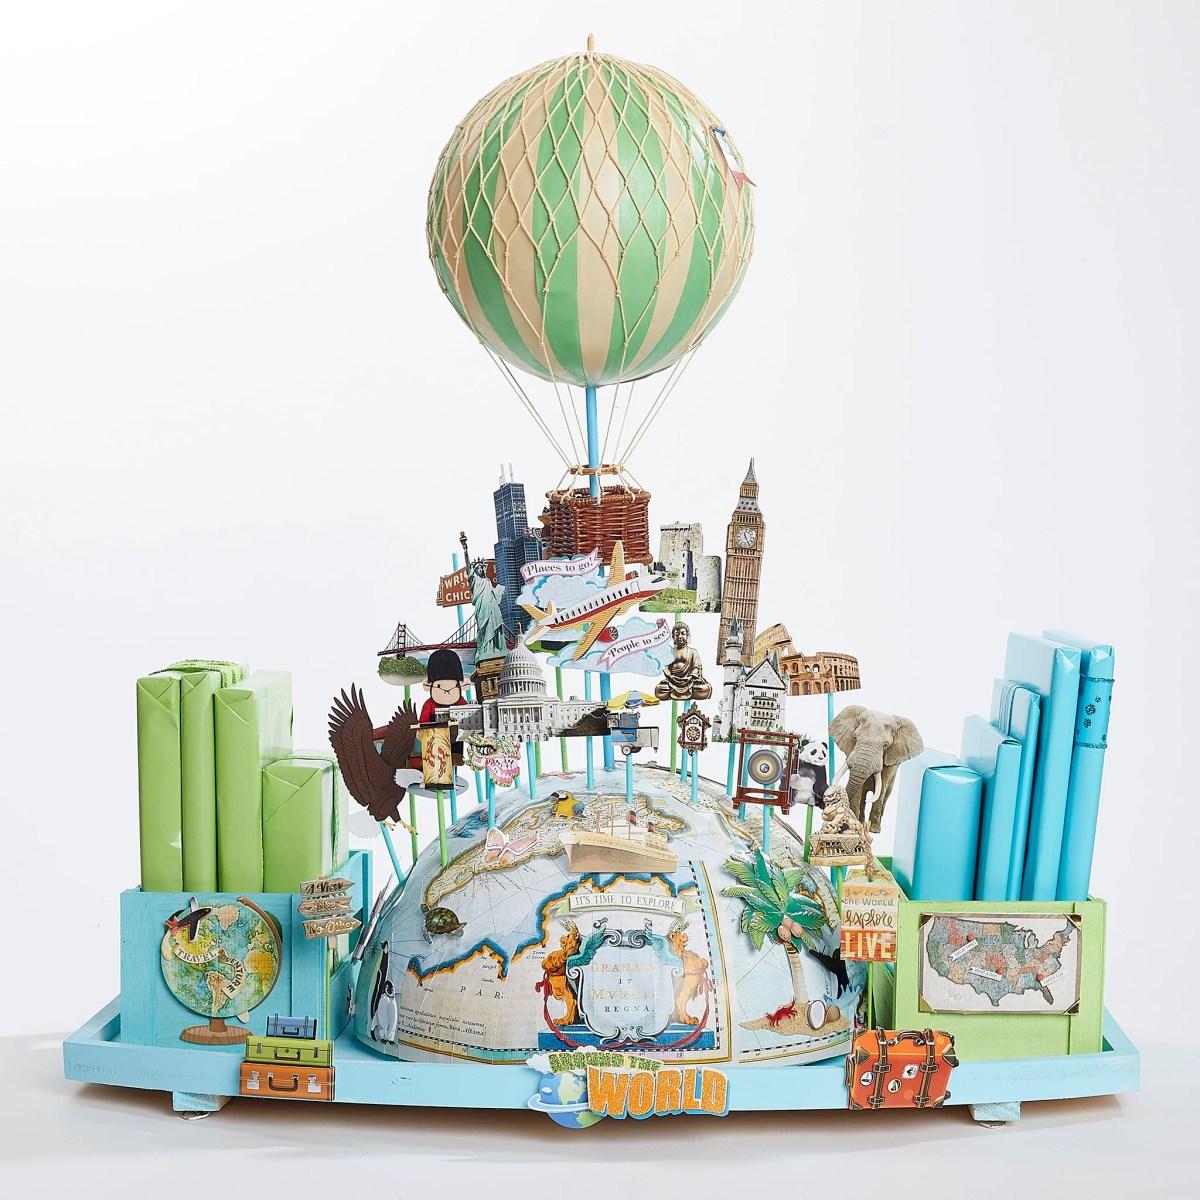 Resultado de imagen para gift around the world